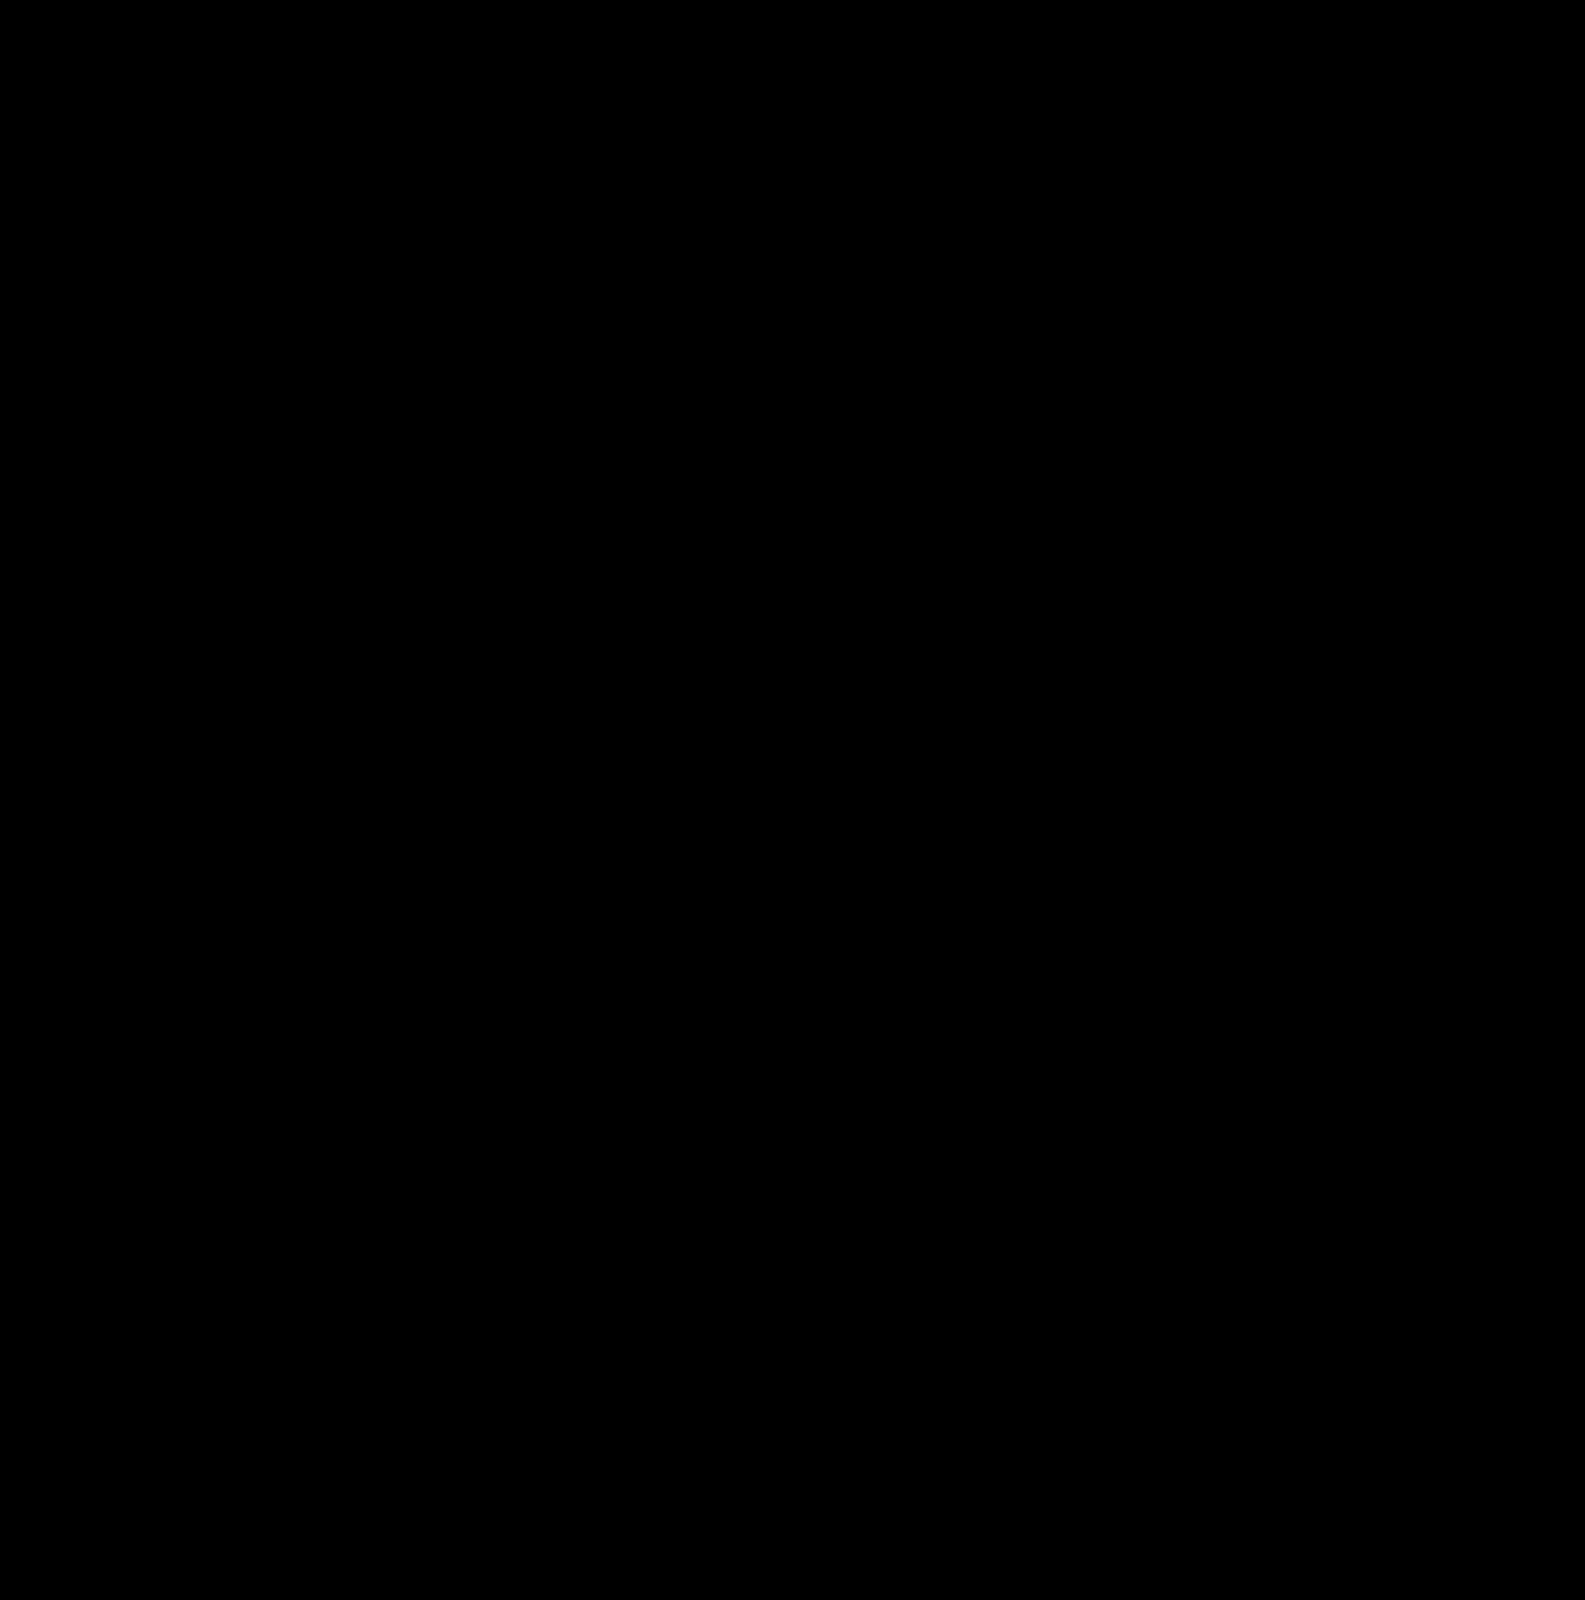 Perfect Ed Sheeran Piano Sheet Music With Lyrics: Waka+Waka+Viol%C3%ADn-1.png (1585×1600)